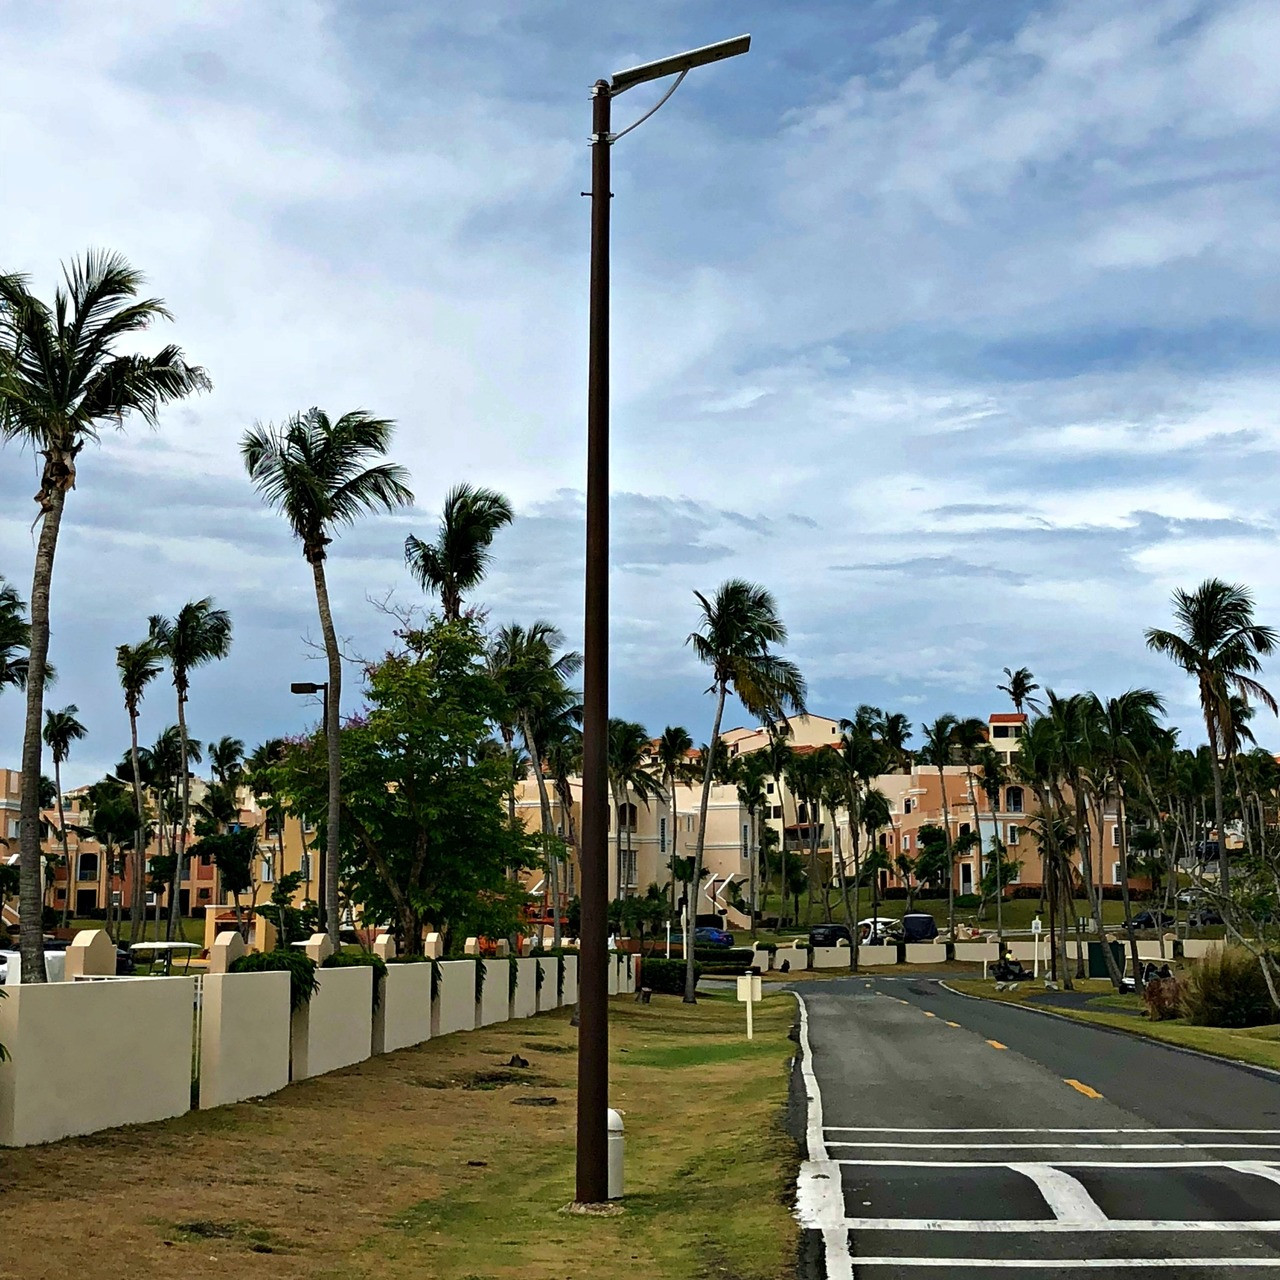 Light Poles Plus: #4115: Fiberglass Light Poles For Sidewalks & Roadways In